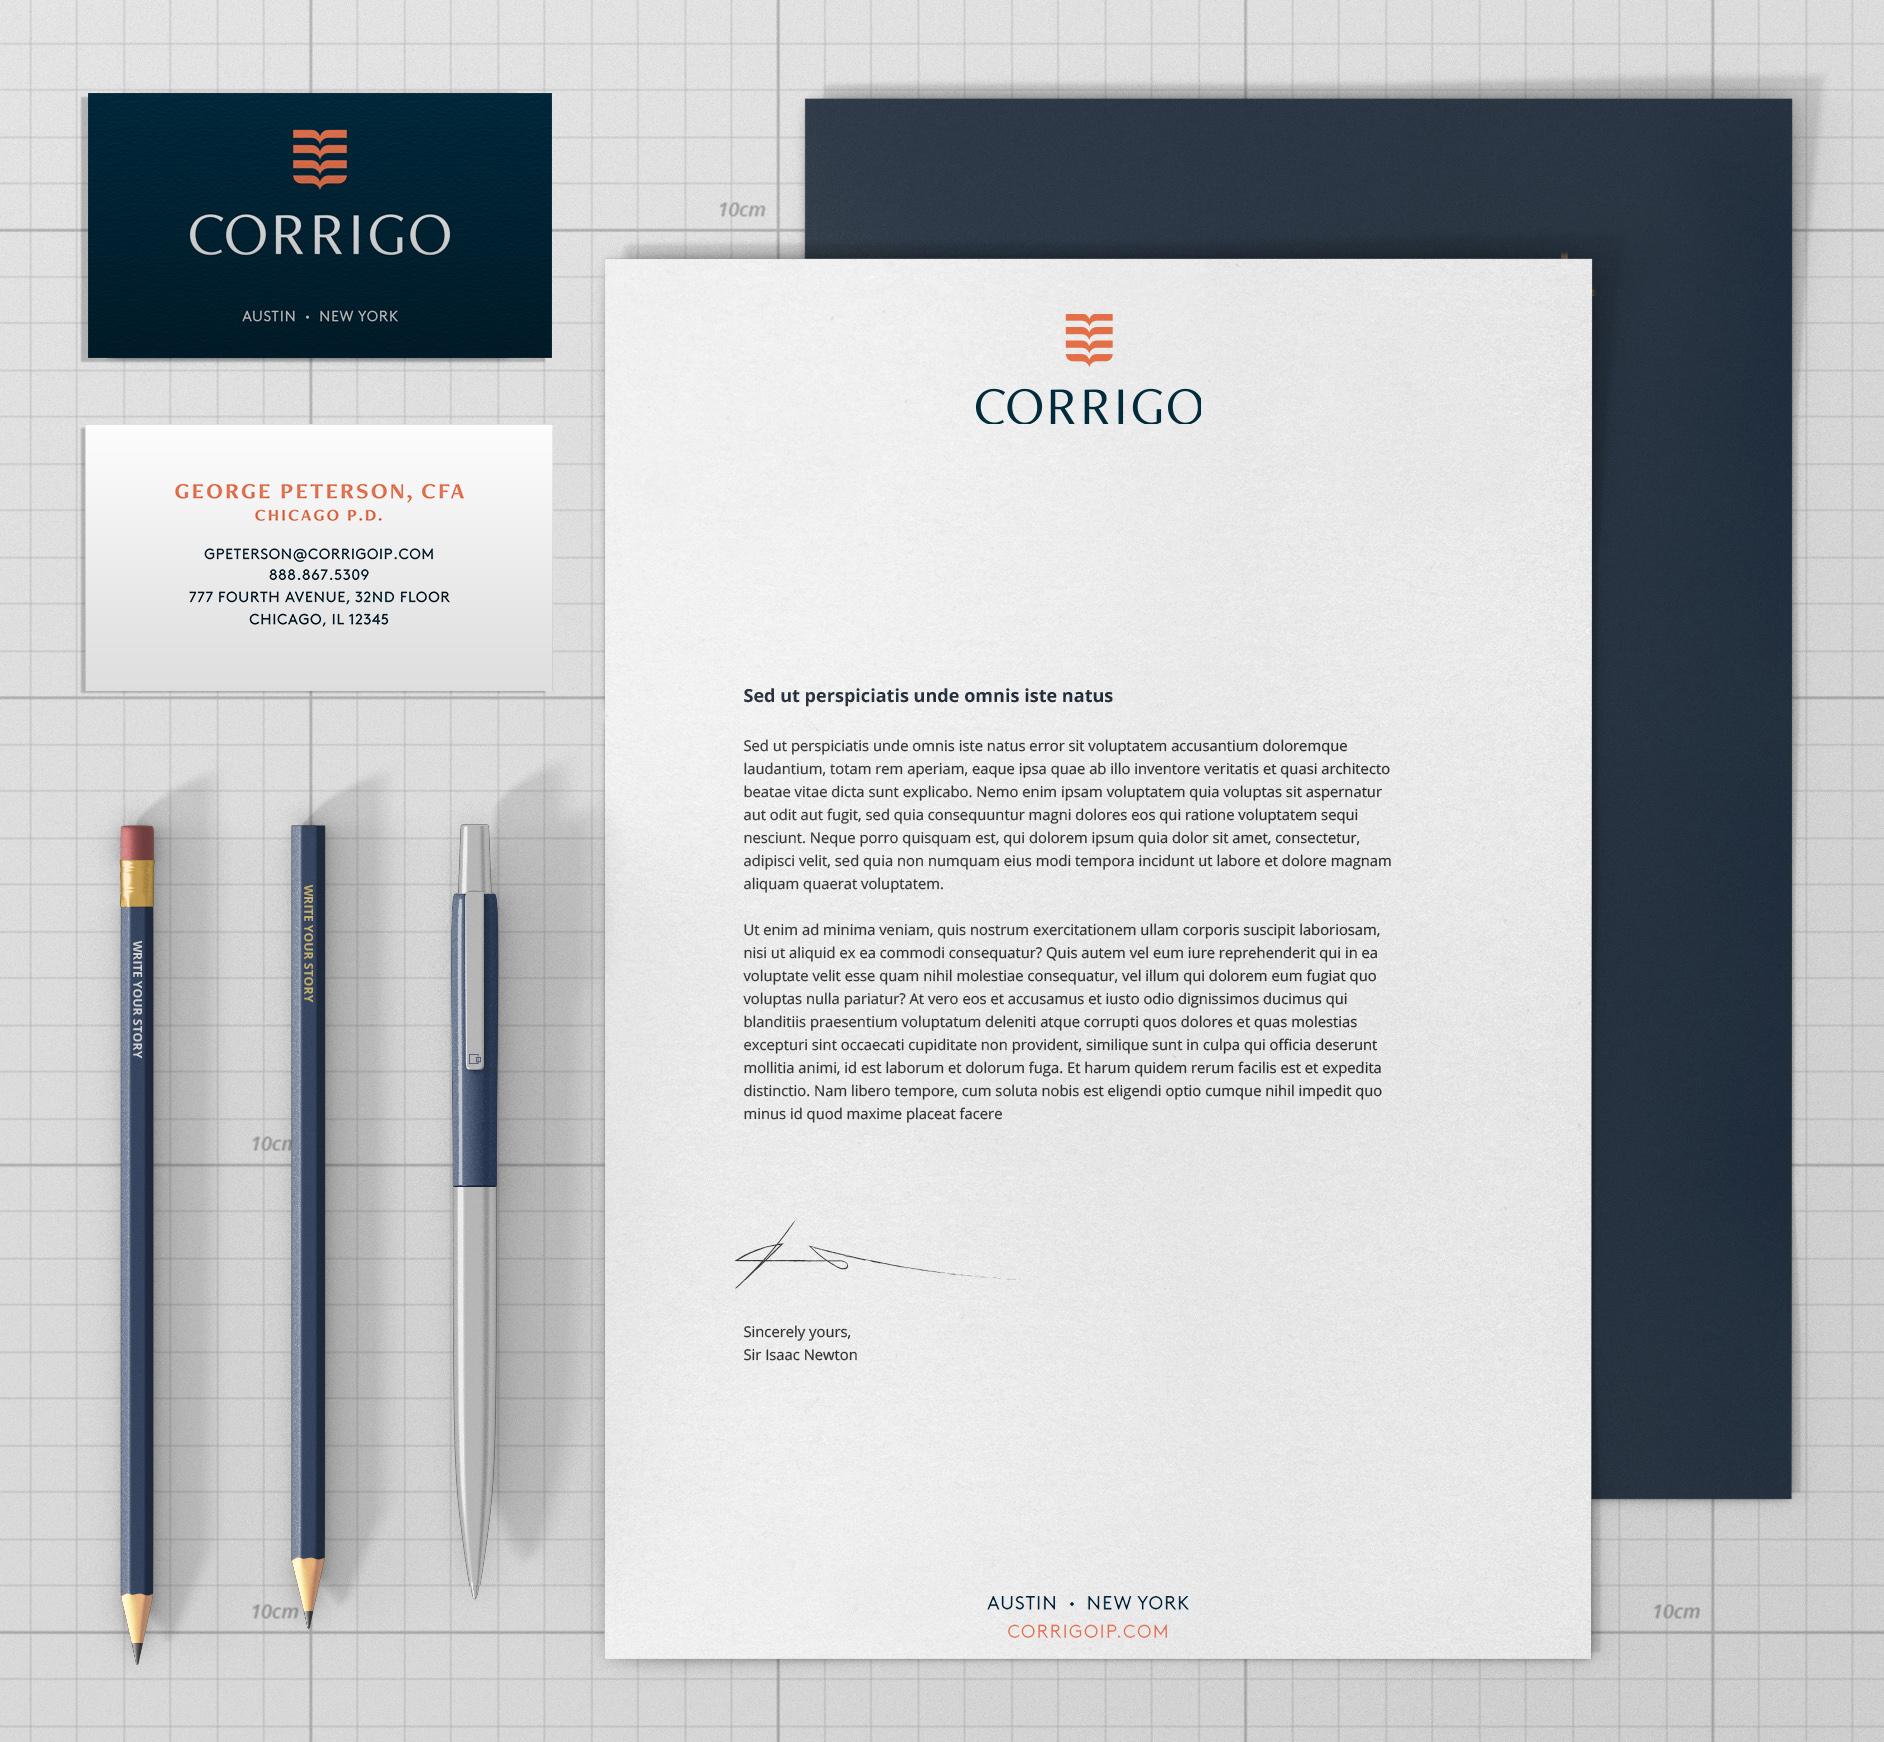 CLIENT : Corrigo - Research, Strategy, Design, Digital Marketing